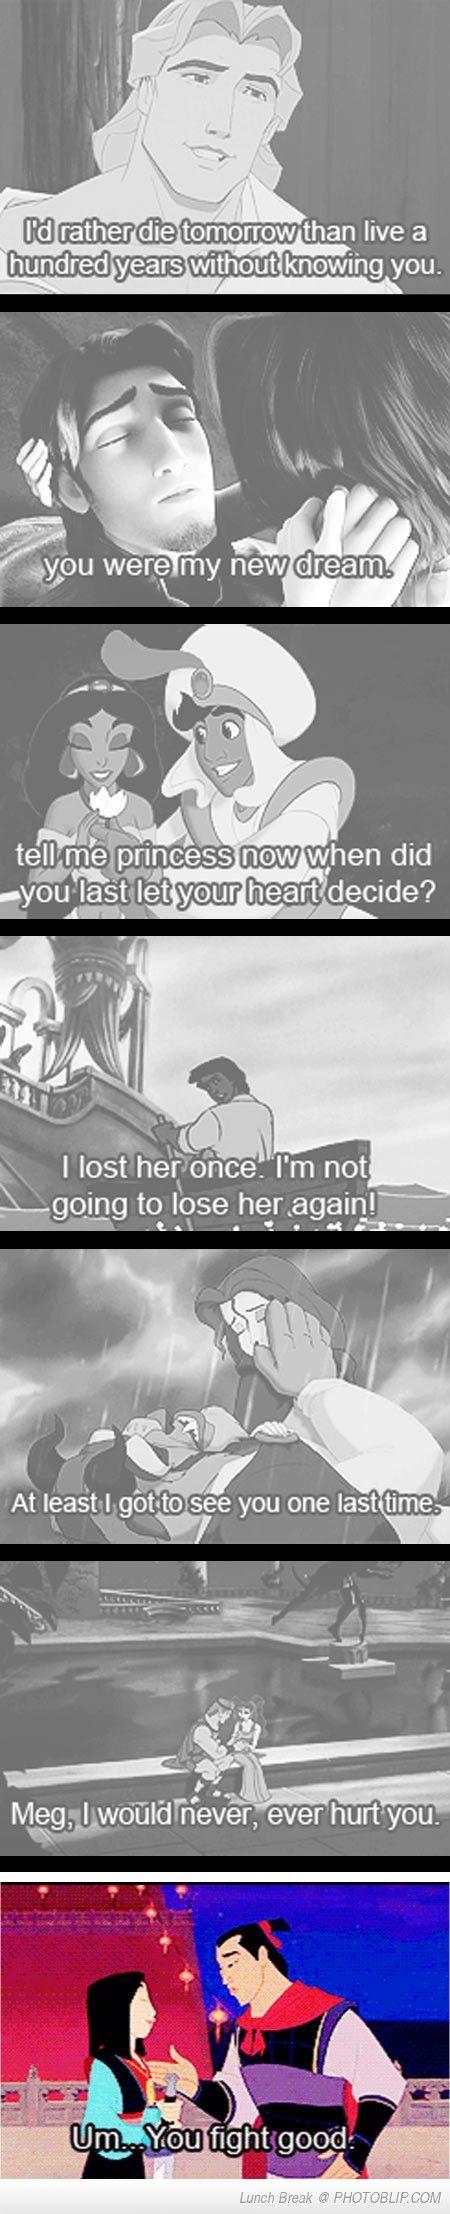 Ahaha poor Mulan